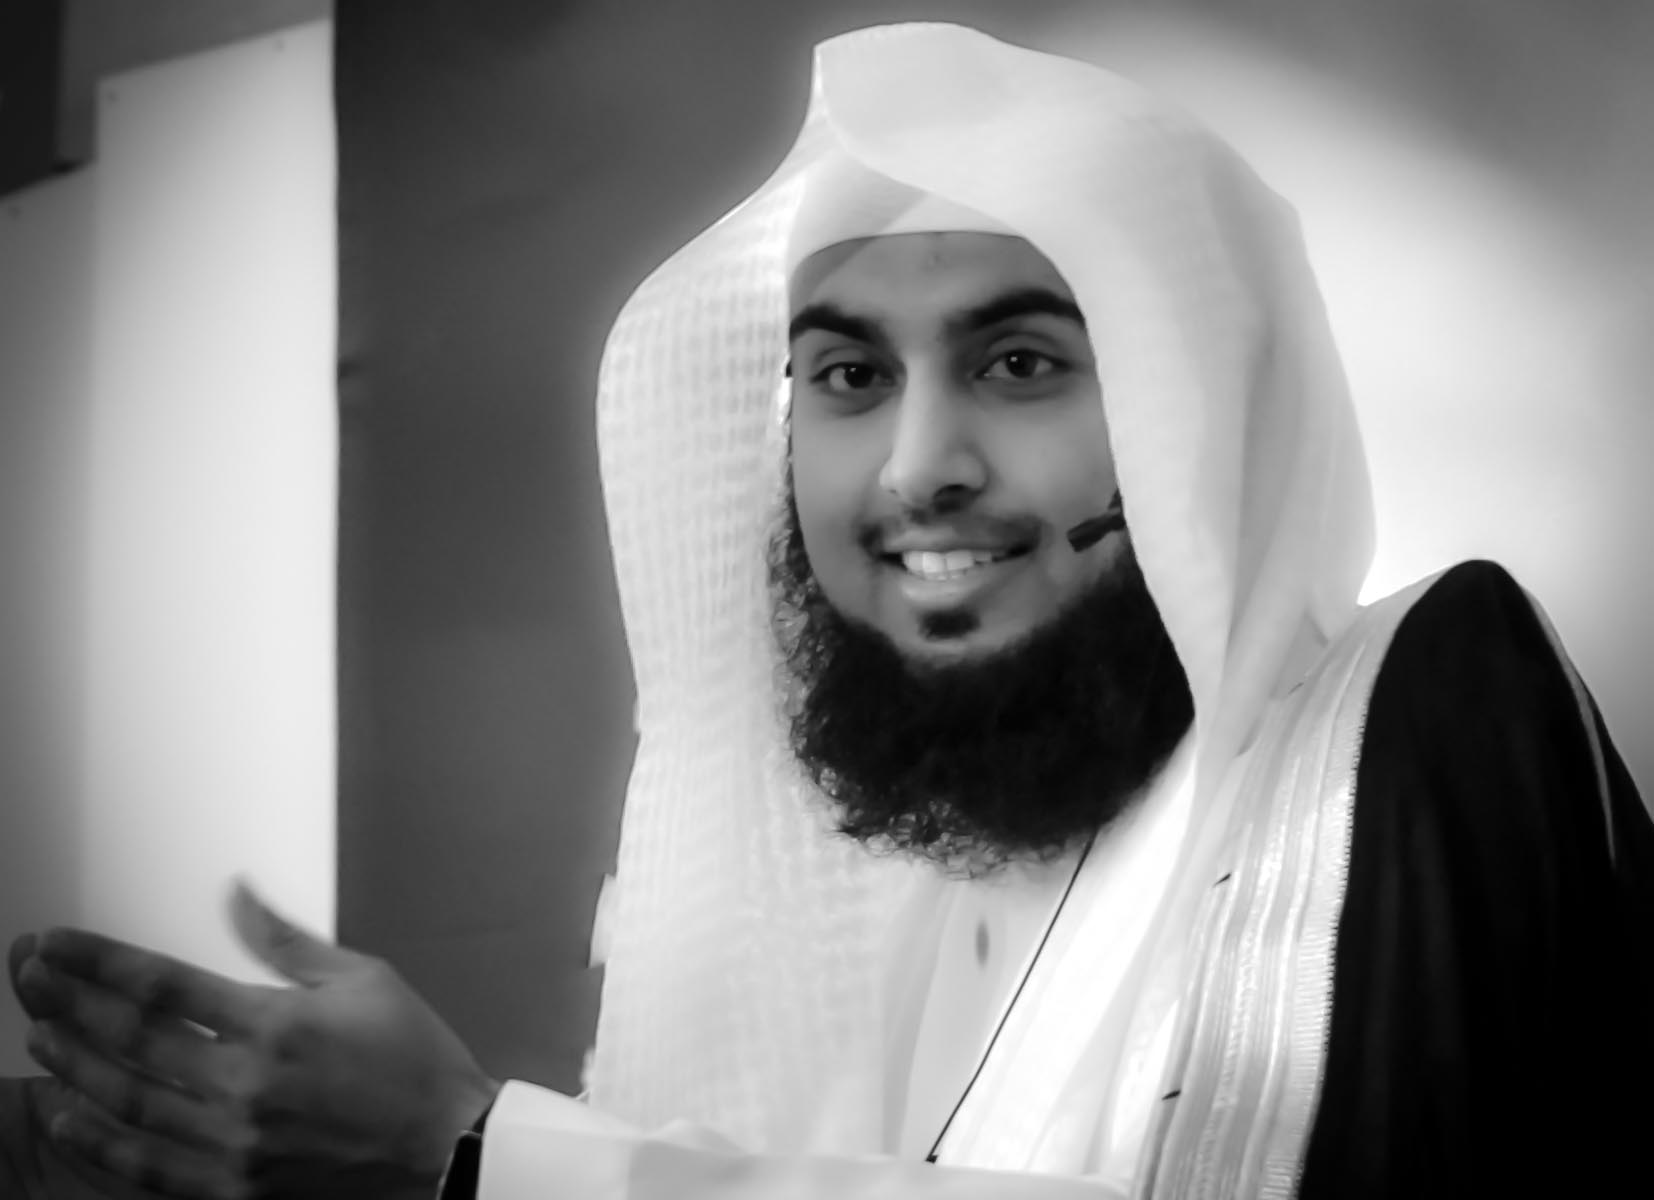 Sheik Sajid Umar